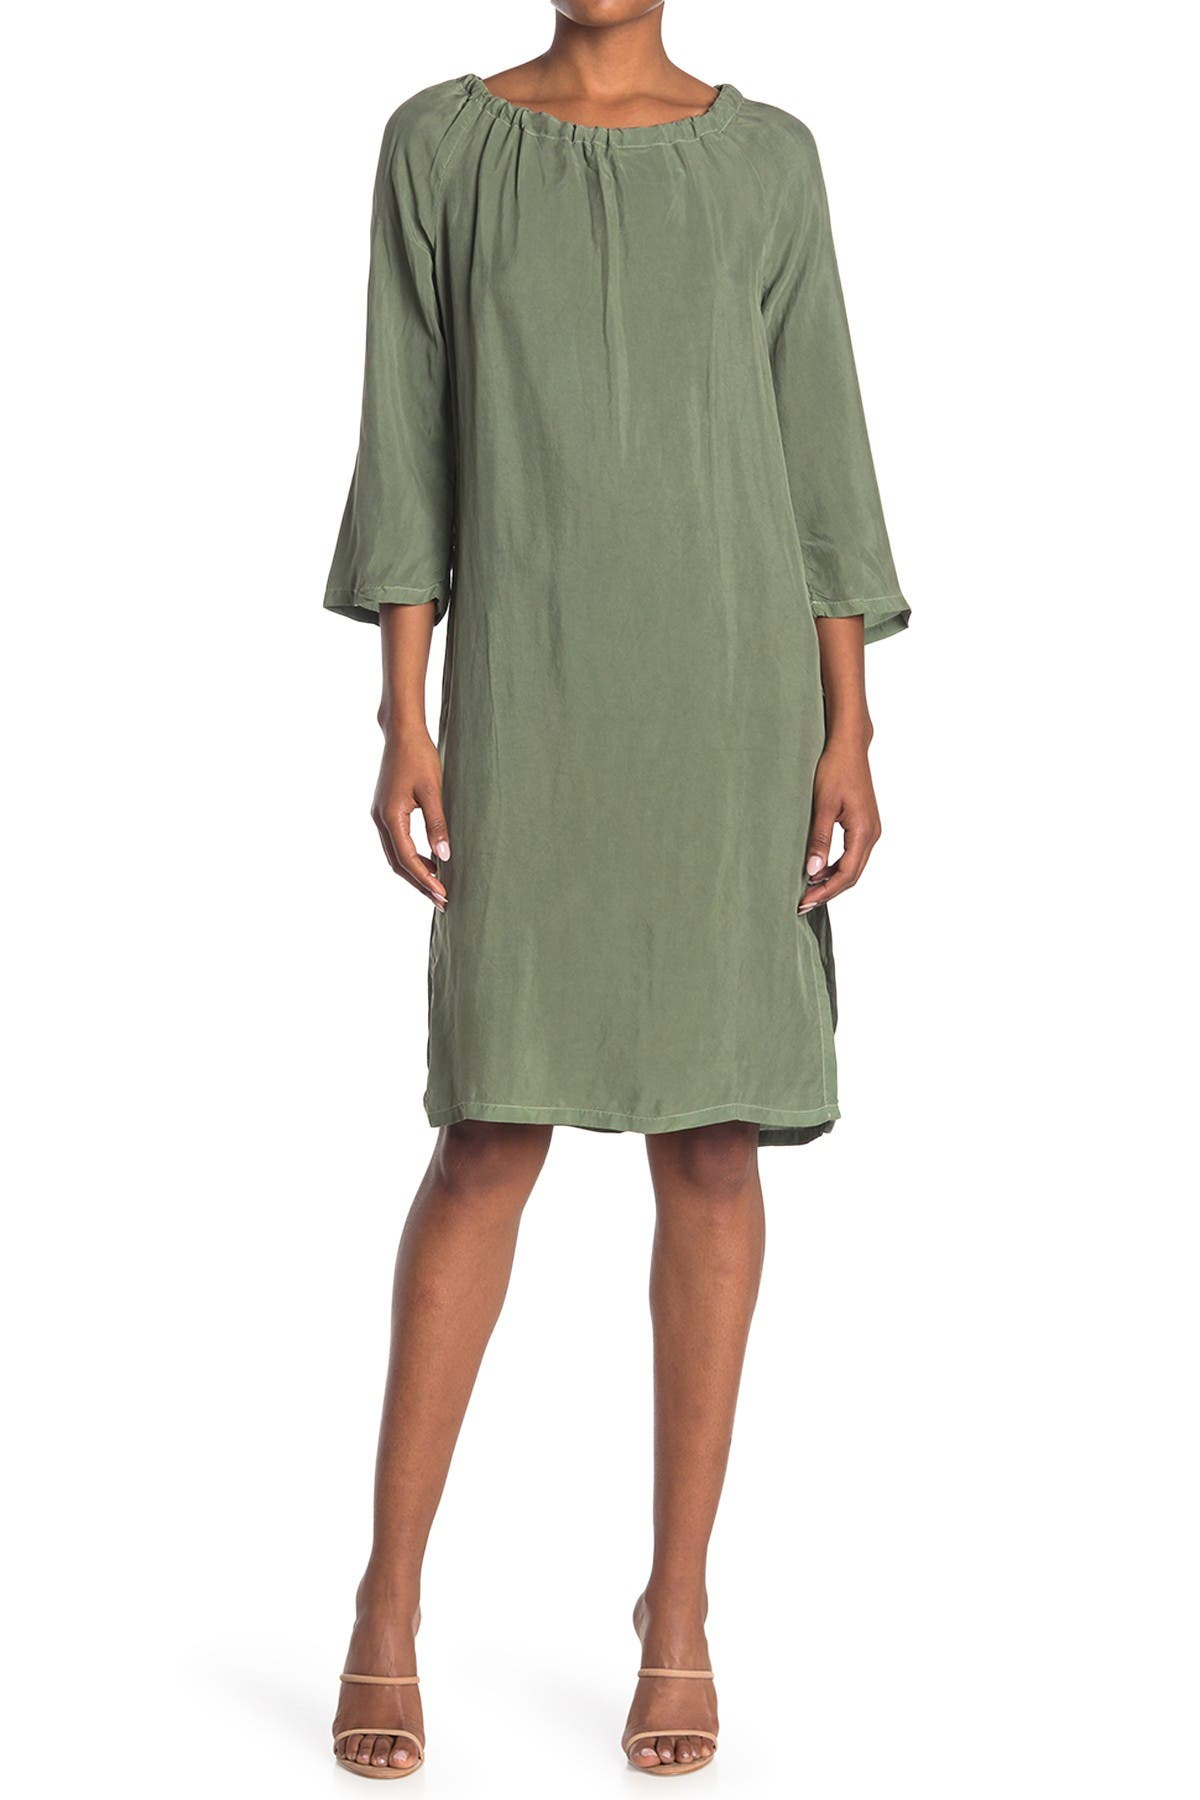 Image of Stateside Cupro Loose Tie Back Dress